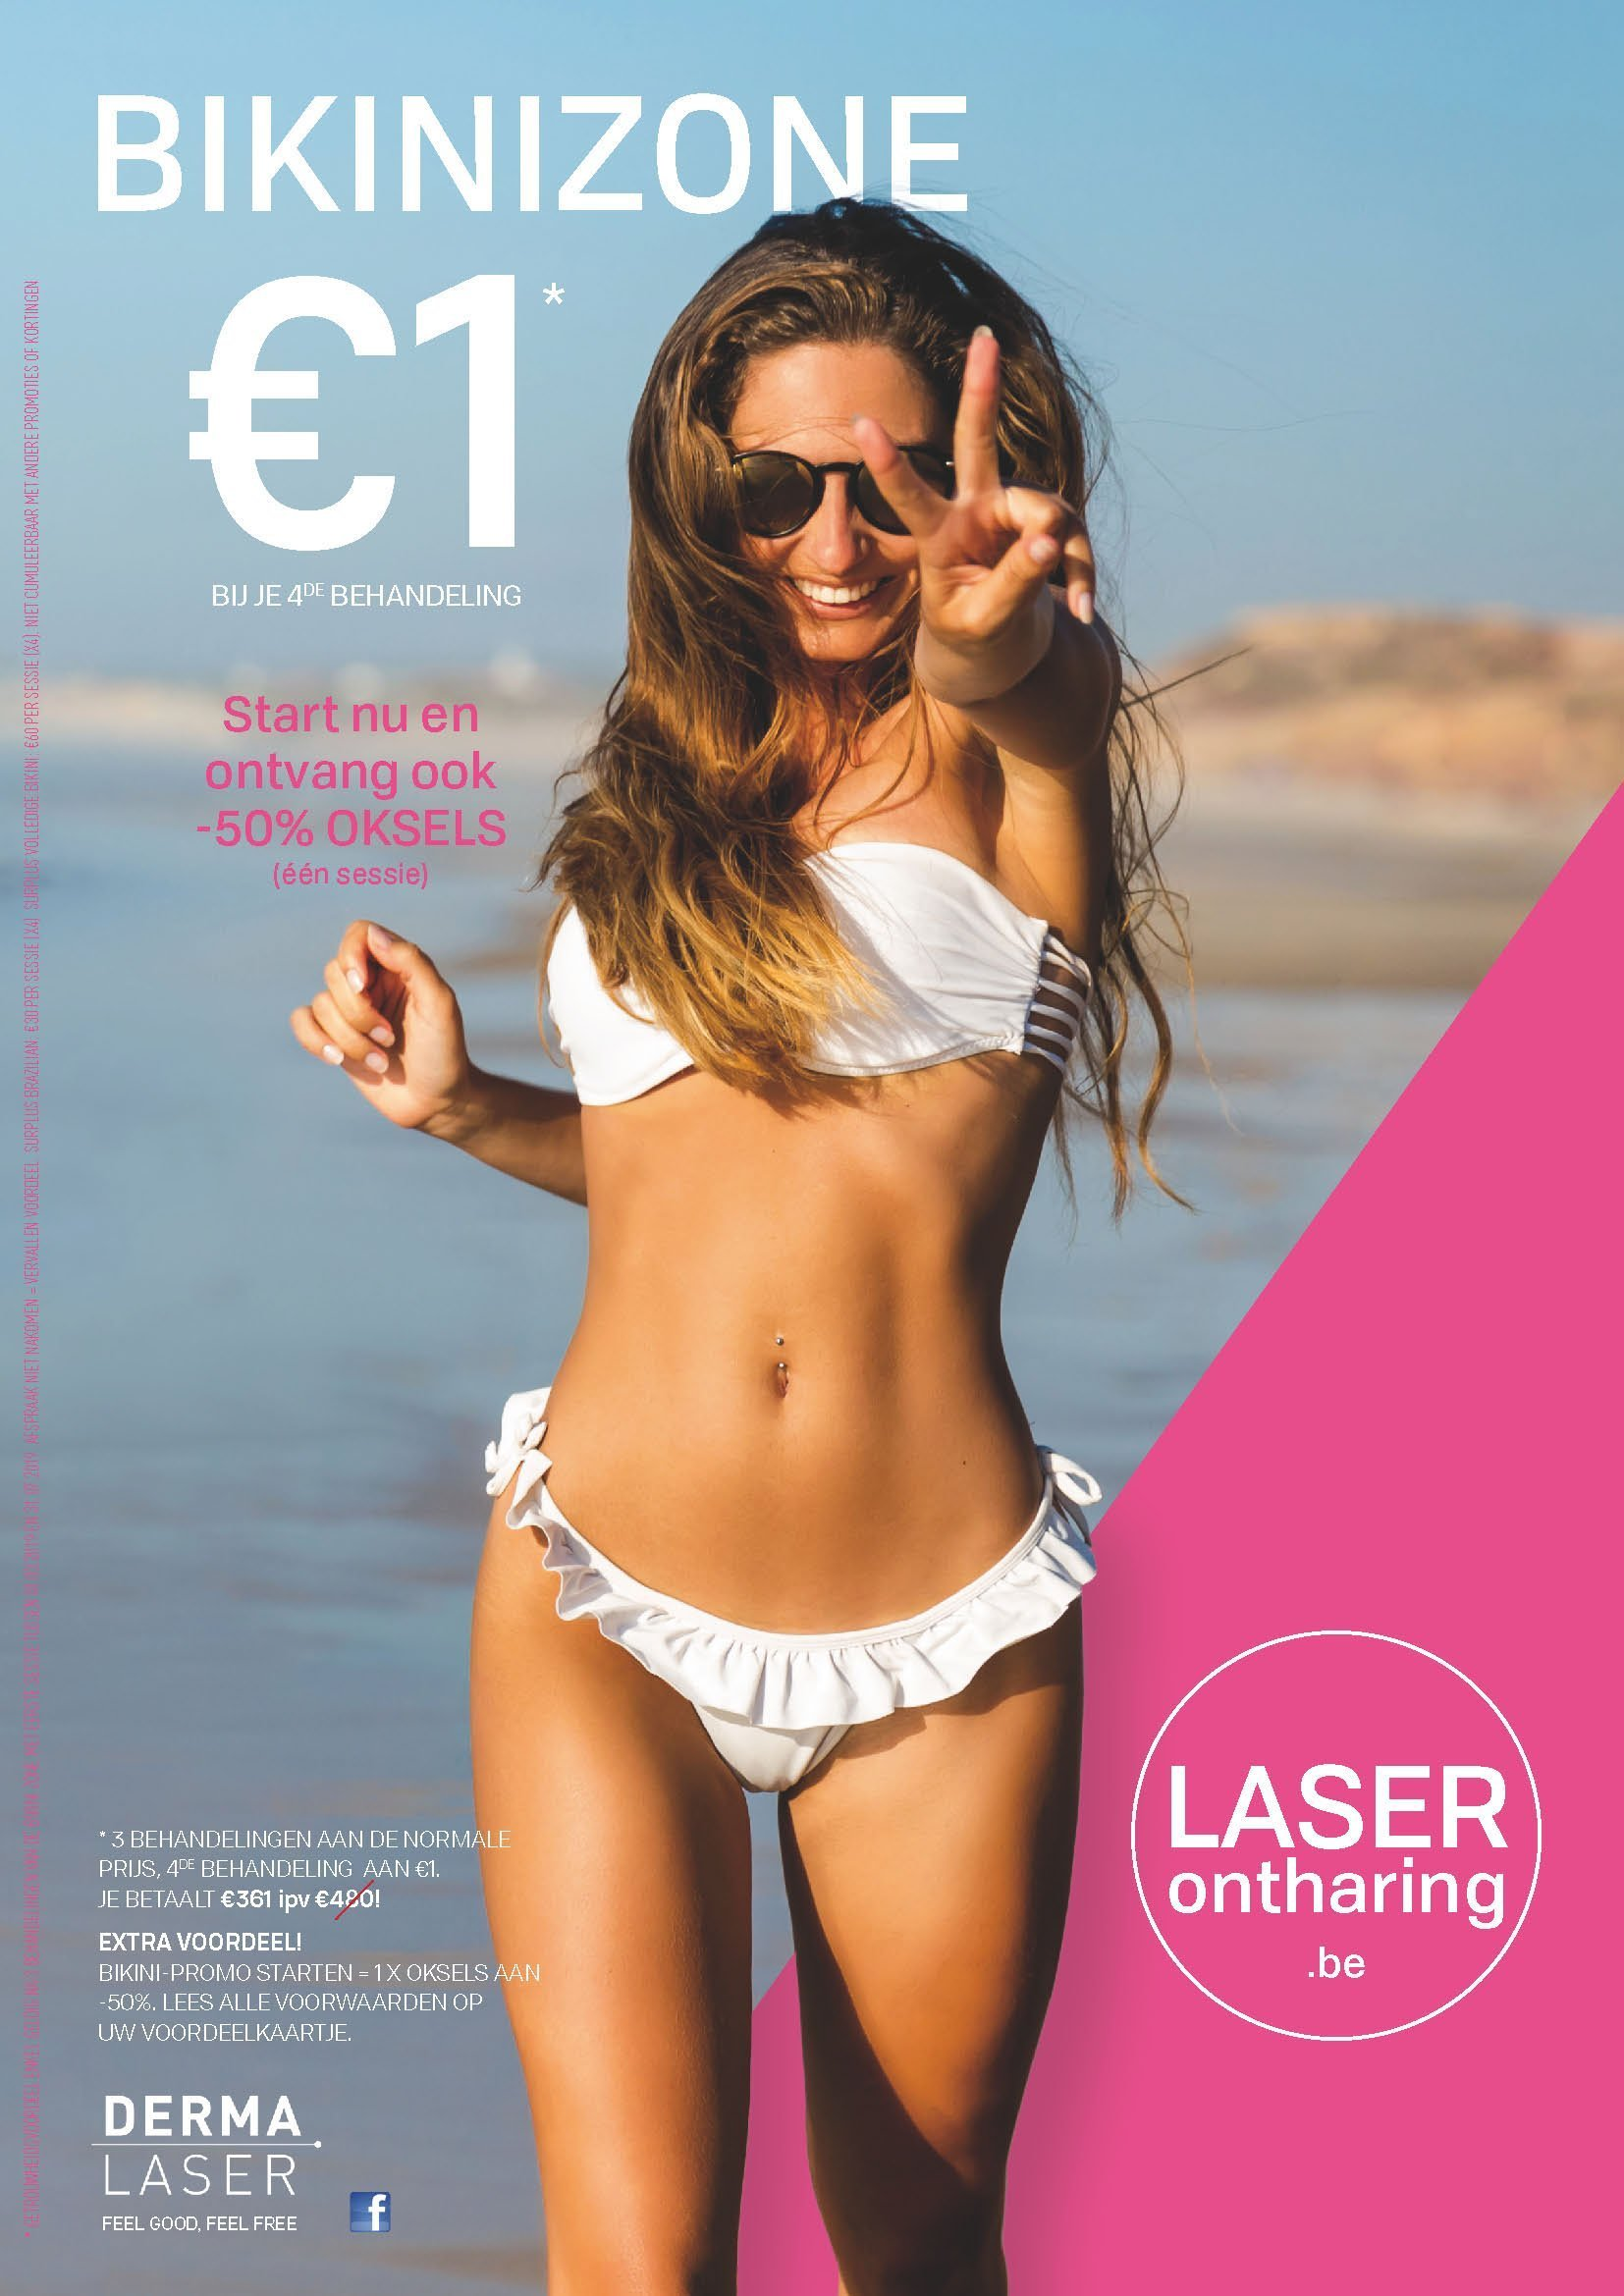 Laserbehandeling Bikini zomer NL